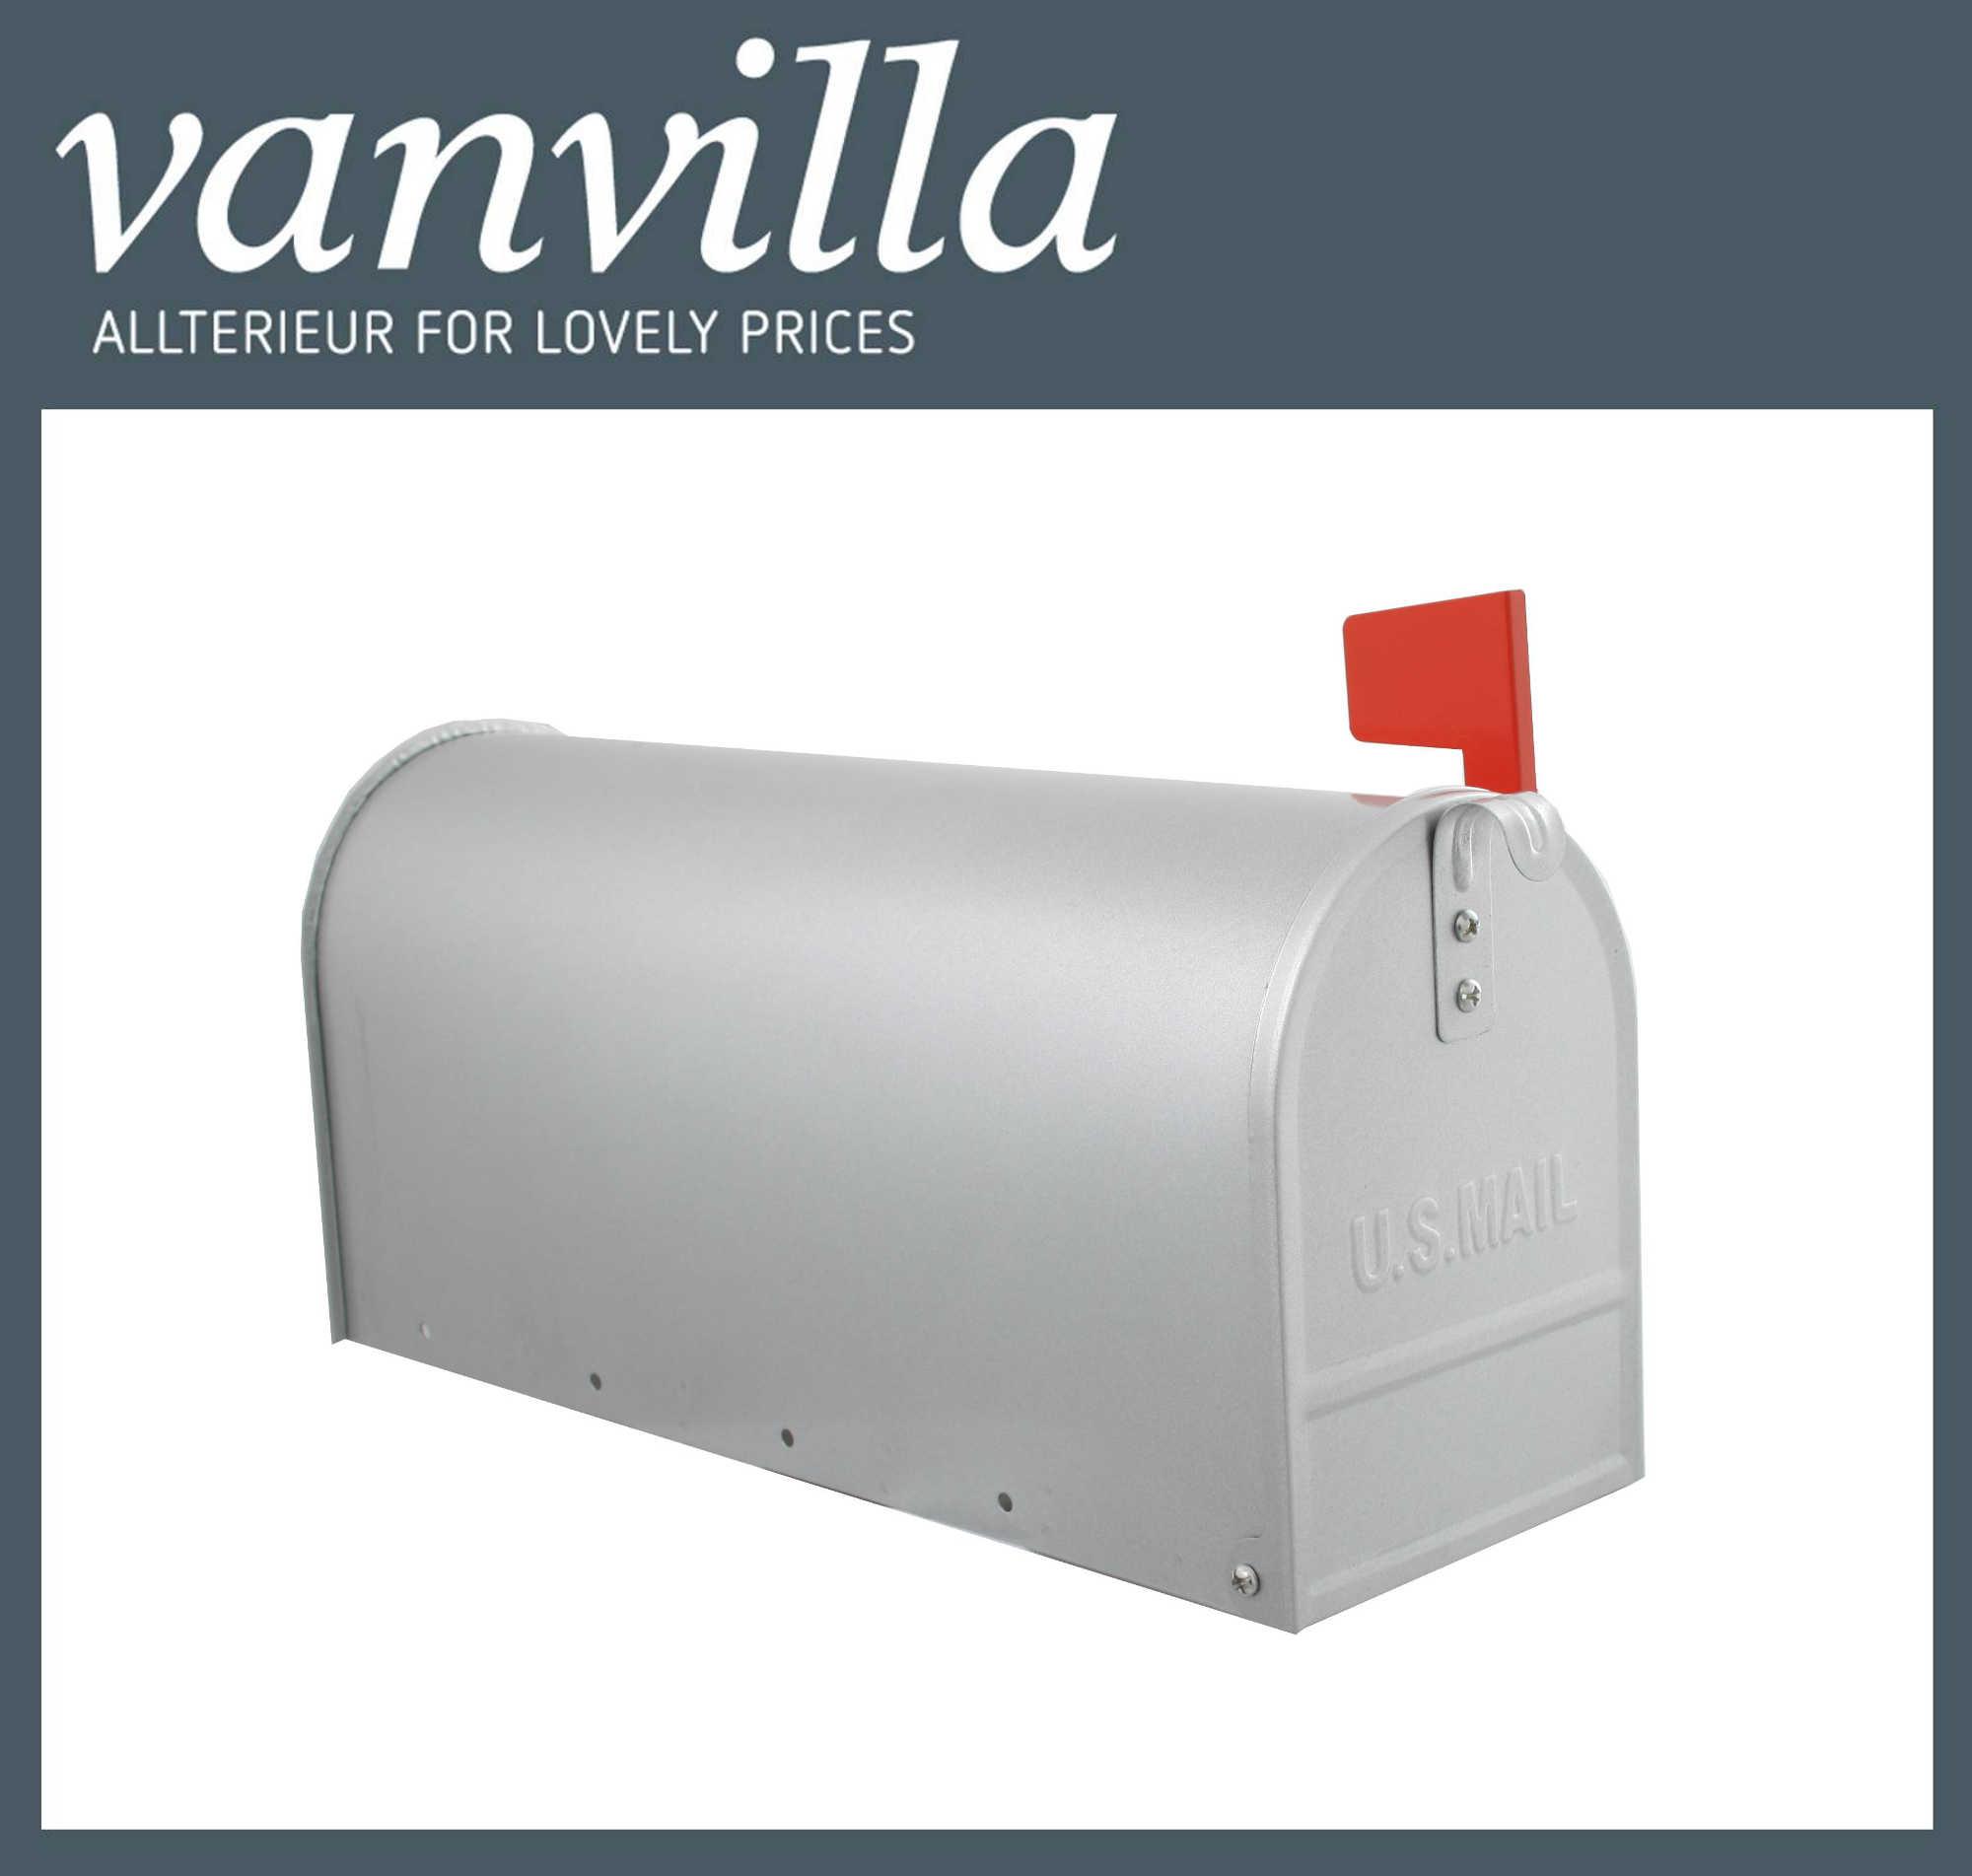 US-Mailbox Silber Stand